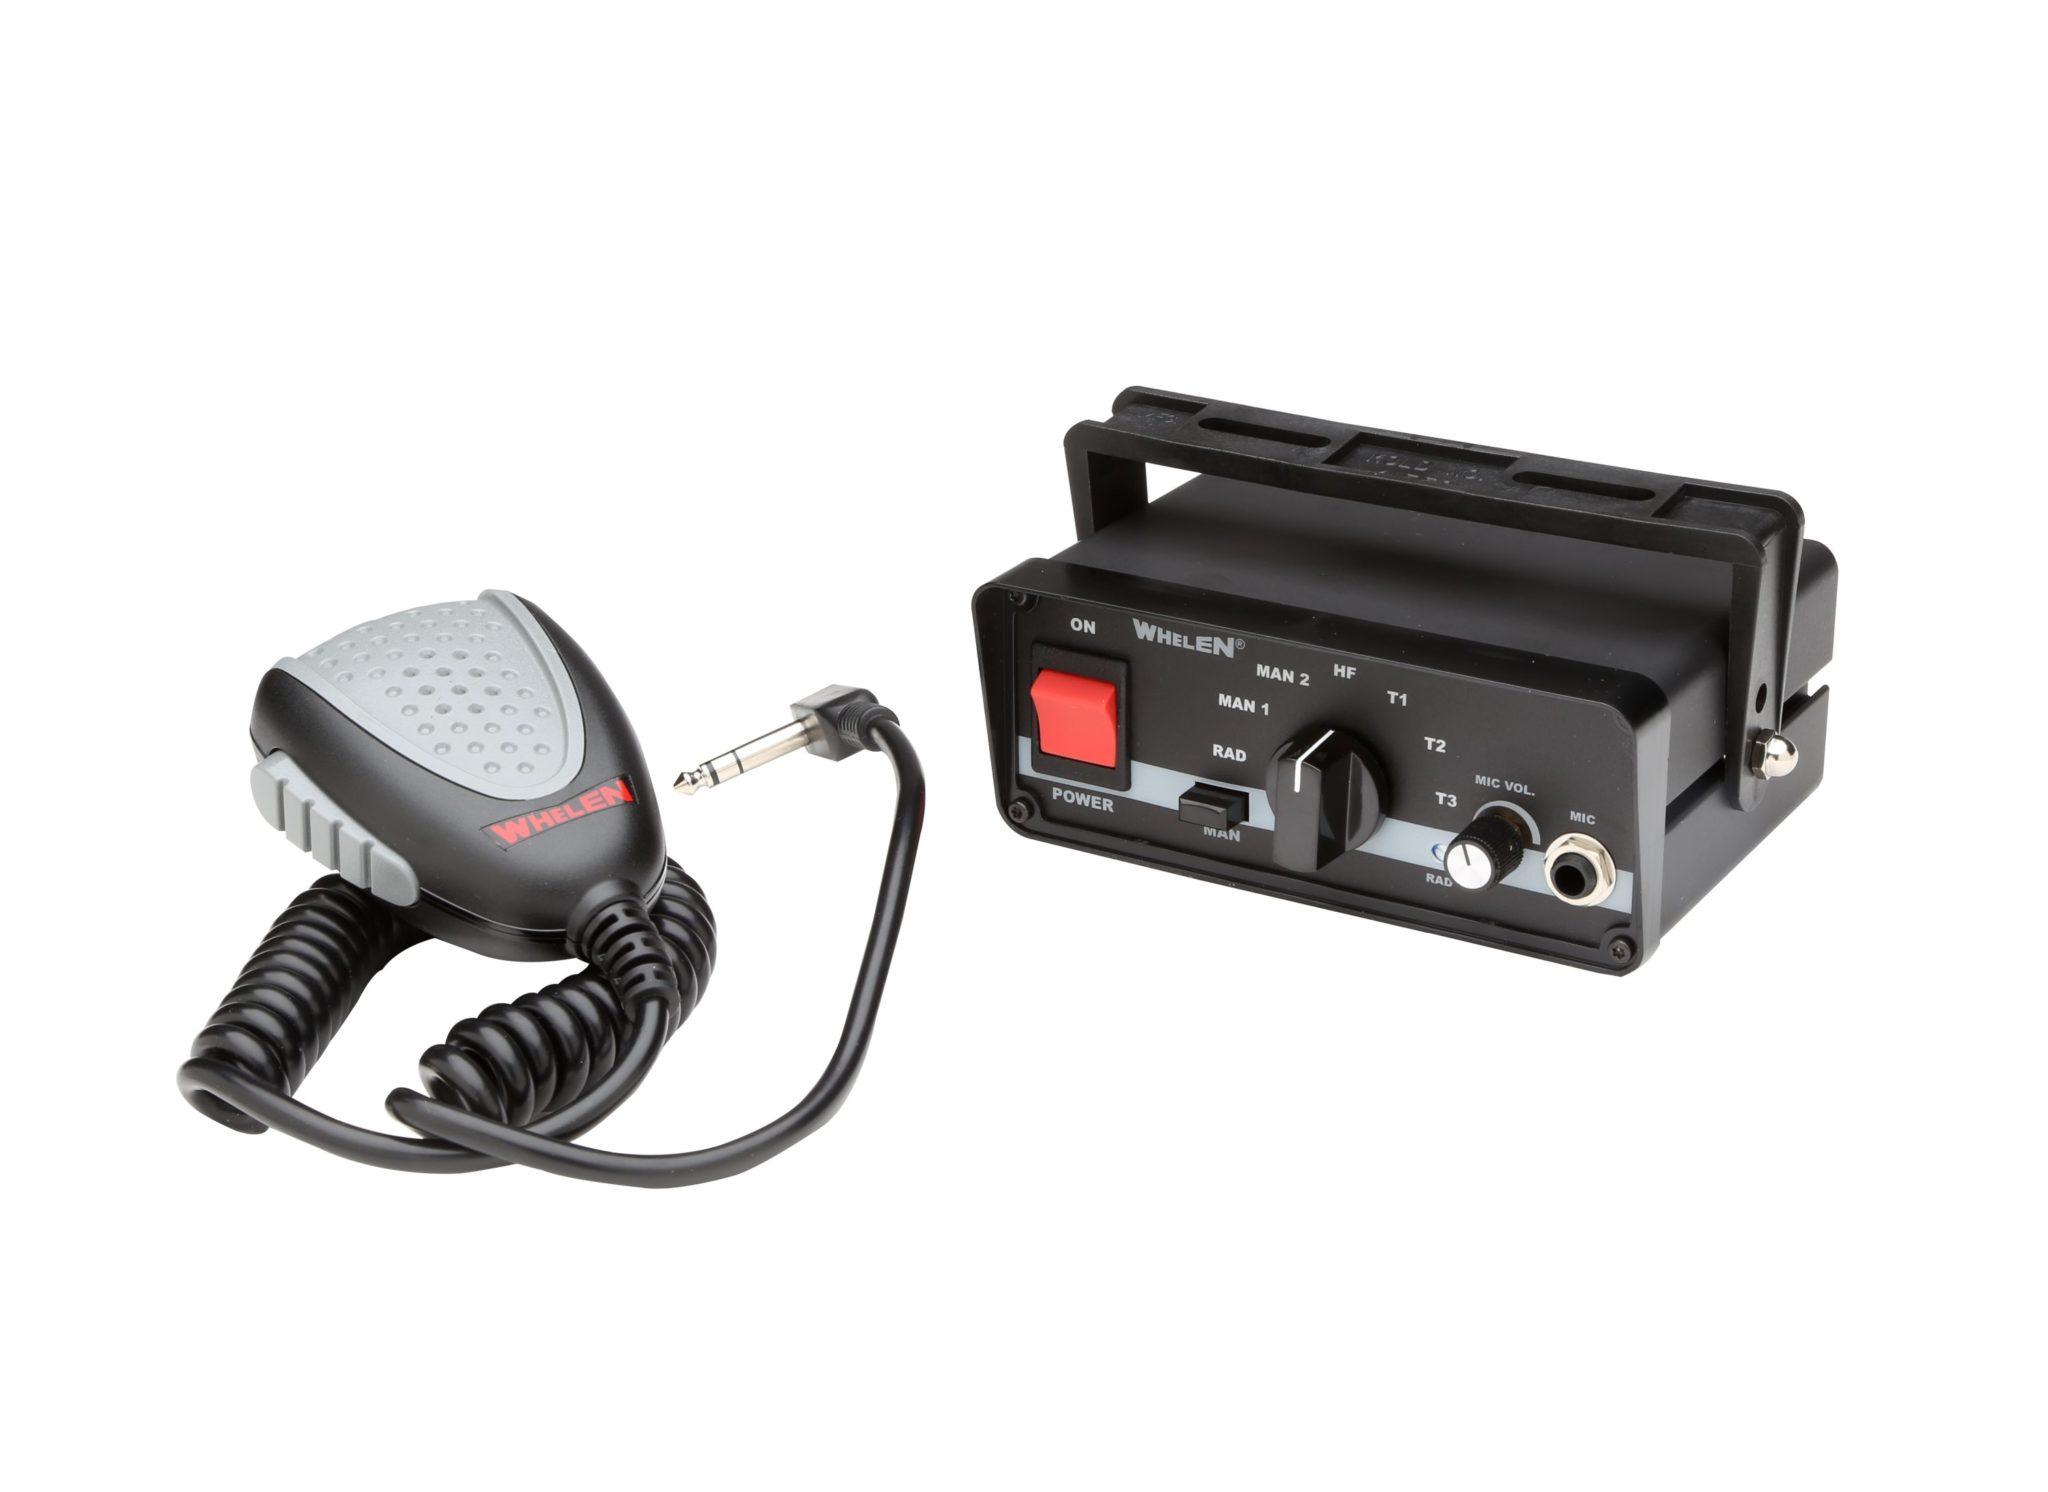 WHELEN 295HFSA6 200 WATT SIREN AMPLIFIER w//harness Police Car Take-out equipment